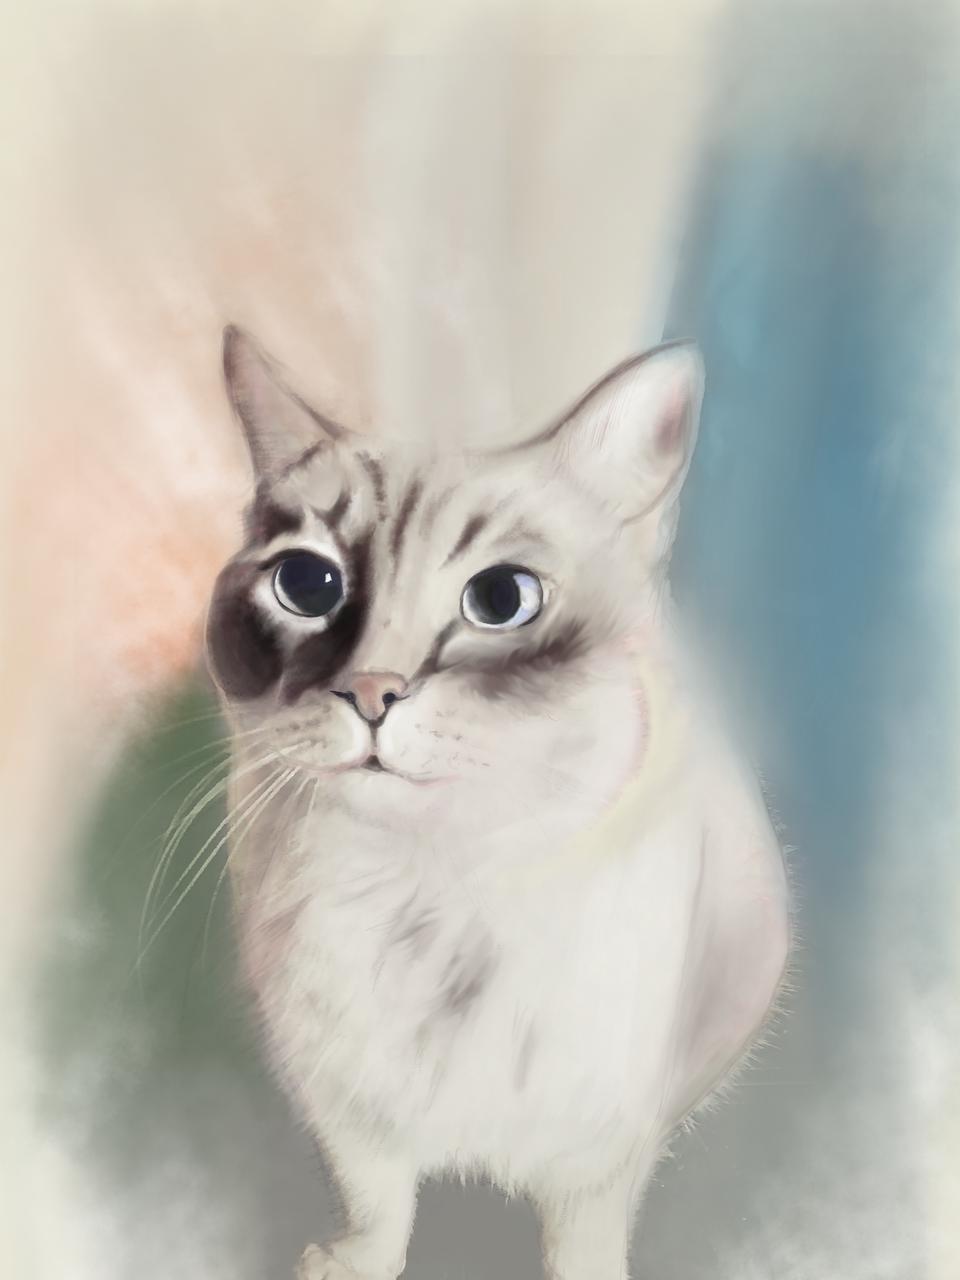 Friend  Illust of Sunevto ARTstreet_Ranking September2020_Contest:Furry medibangpaint watercolor animal furry original cat eyes